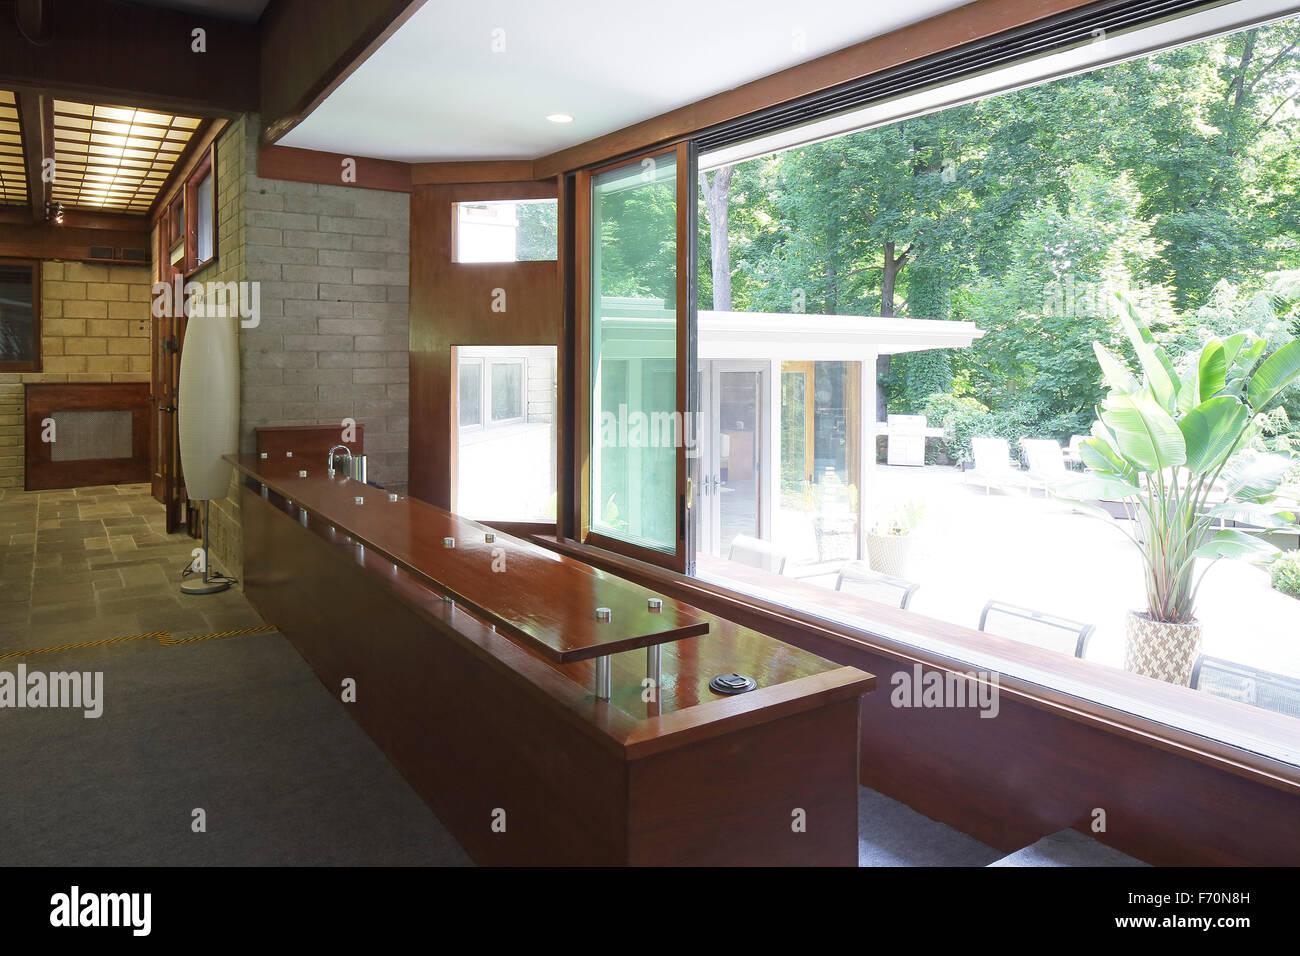 Private Bar Room Stockfotos & Private Bar Room Bilder - Alamy